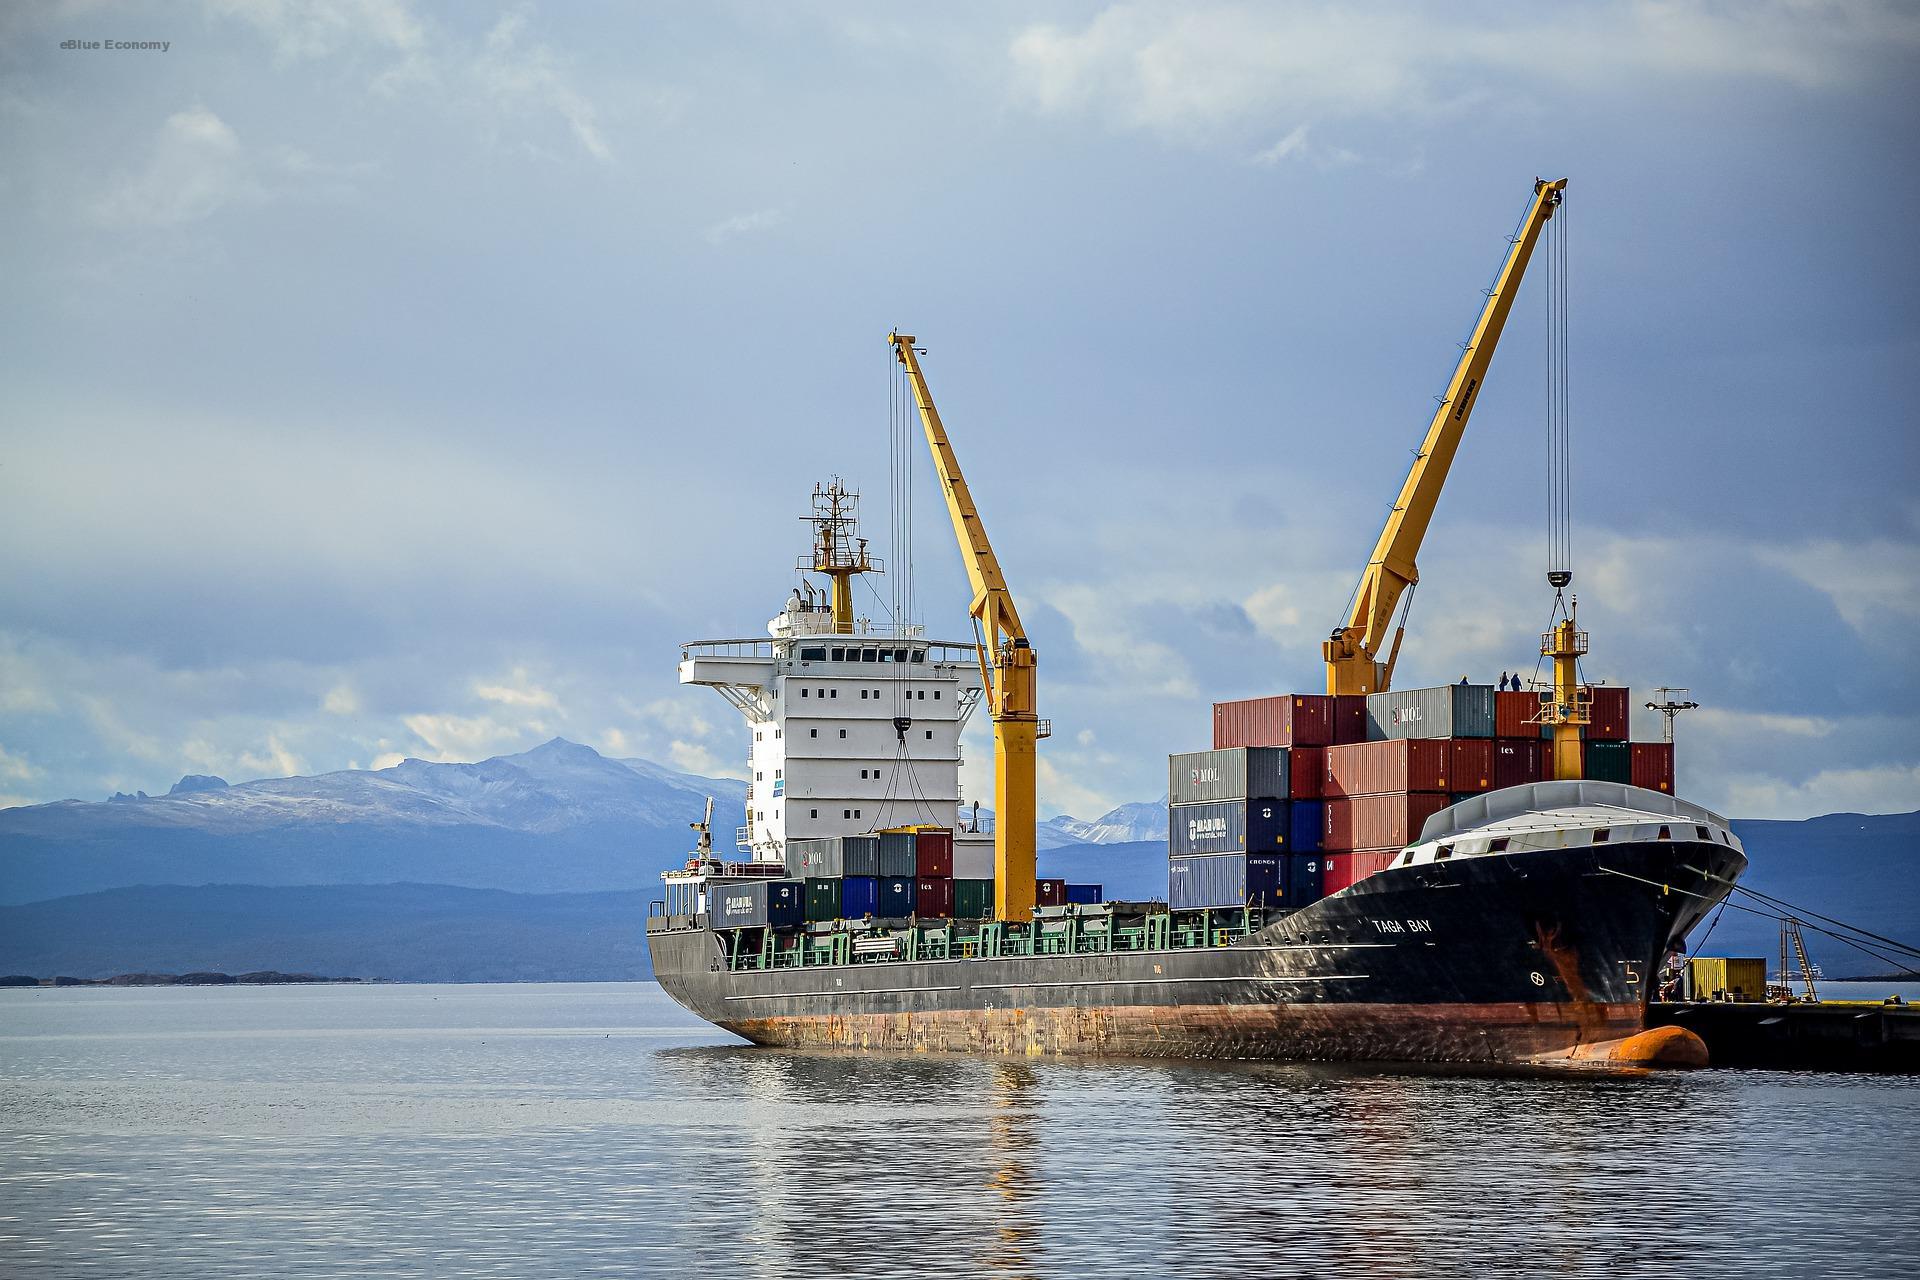 eBlue_economy_DSME plans global alliance to develop green shipbuilding technologies